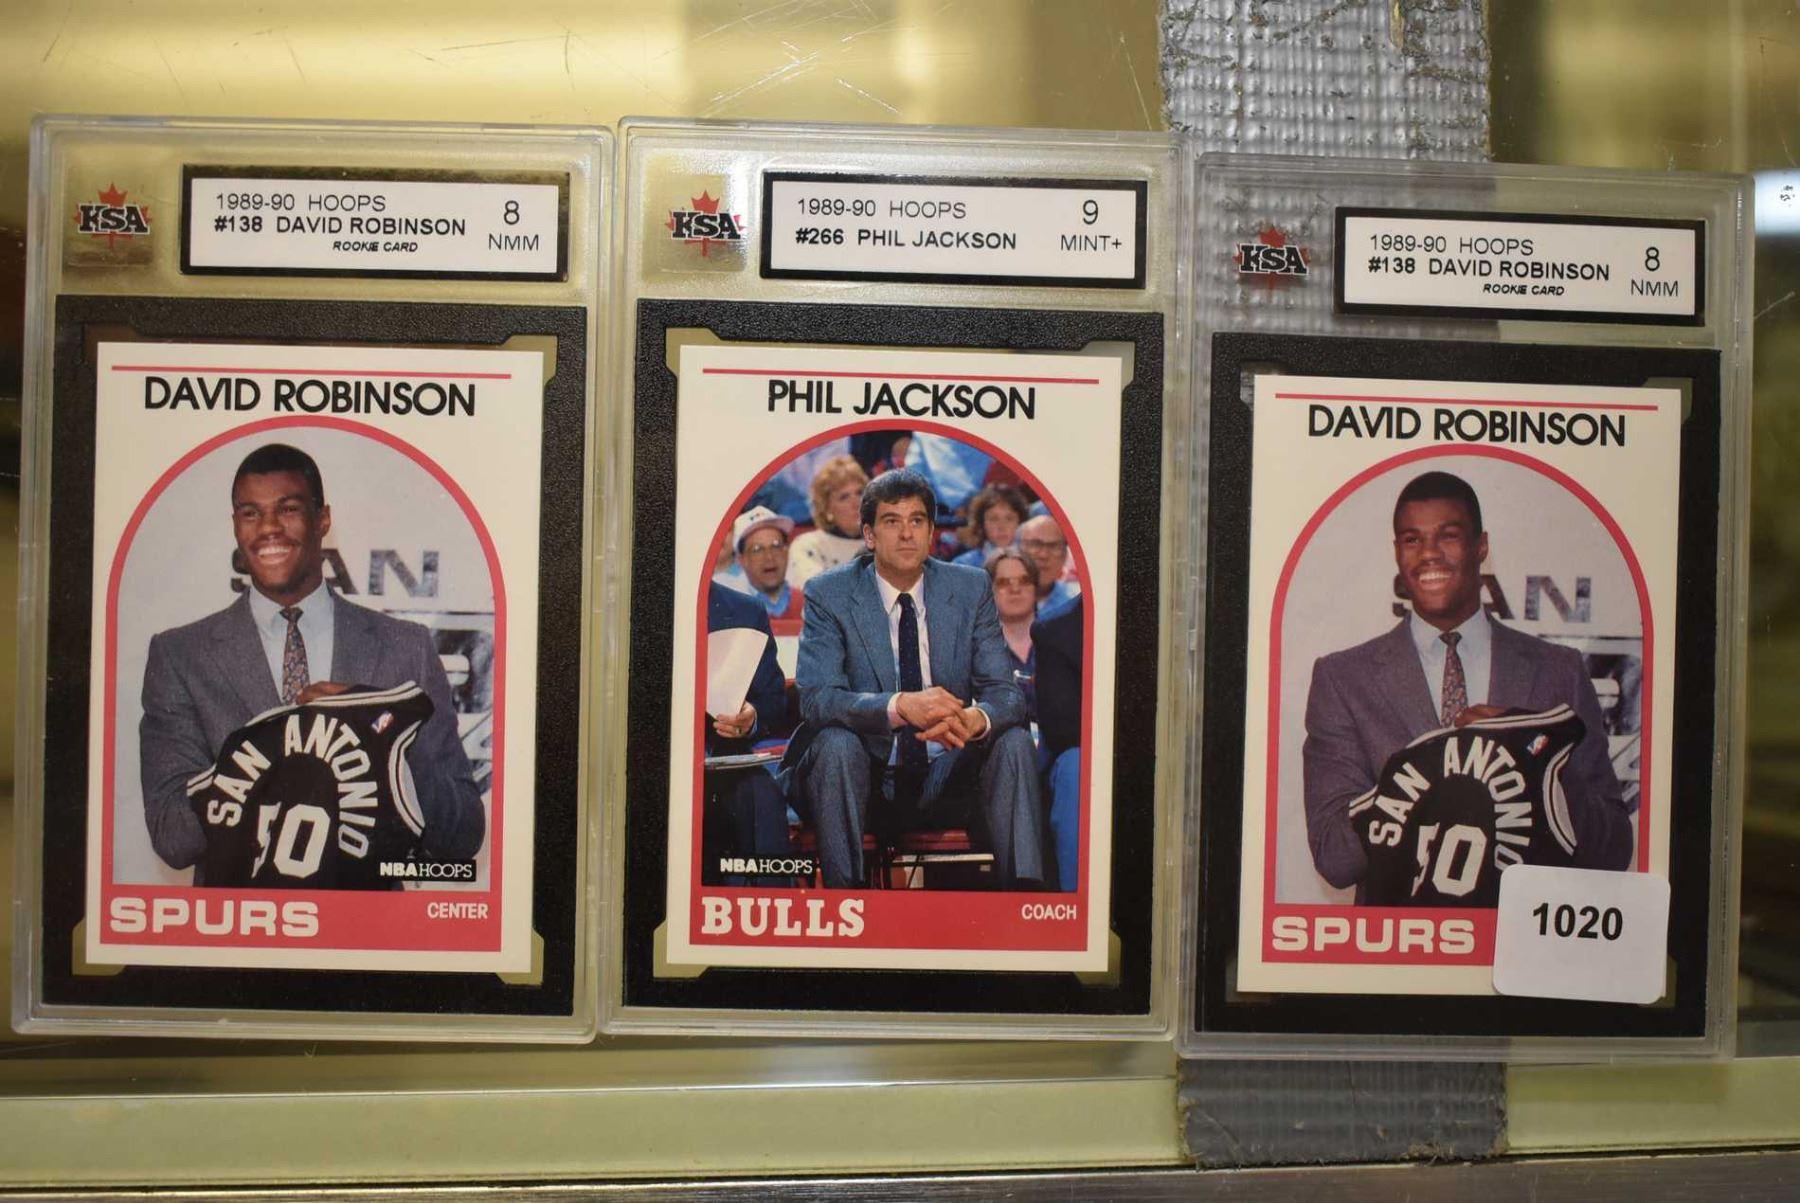 Three Graded Baseball Cards Including Two No 138 David